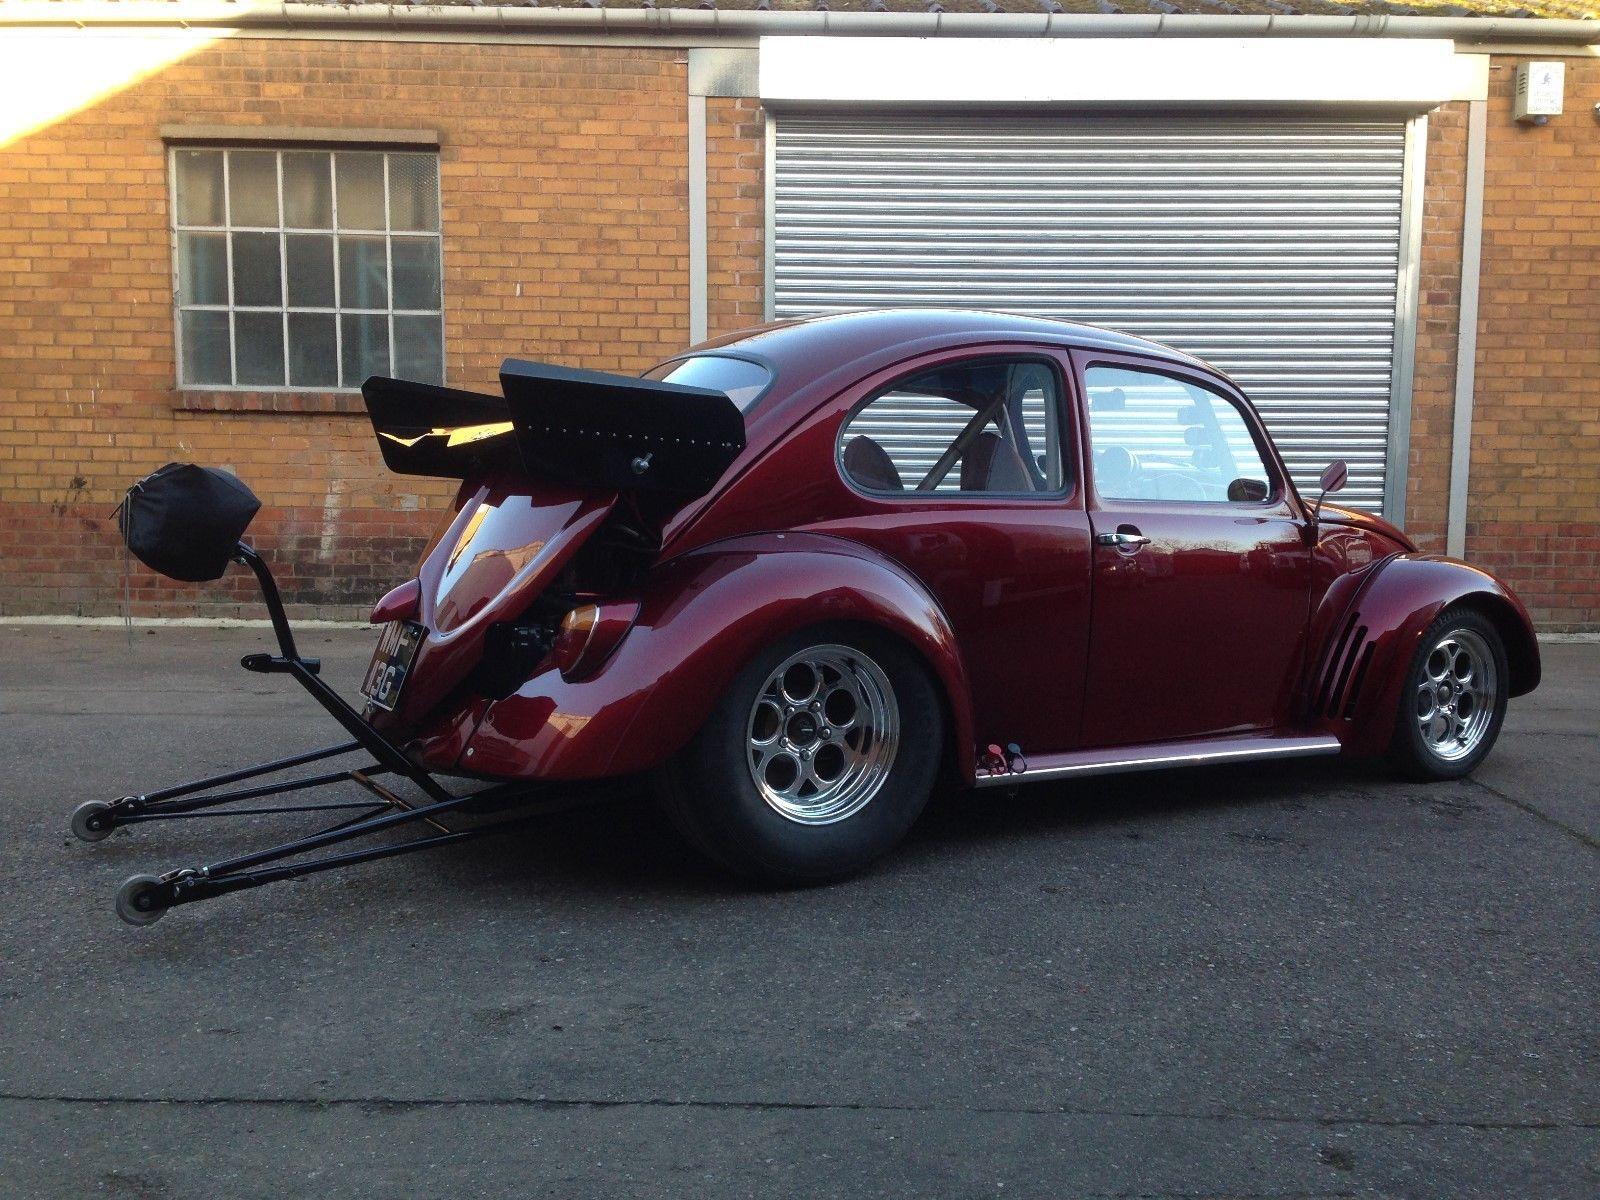 Vw Beetle Show Car 642bhp Subaru Engine Road Legal Drag Race Ebay